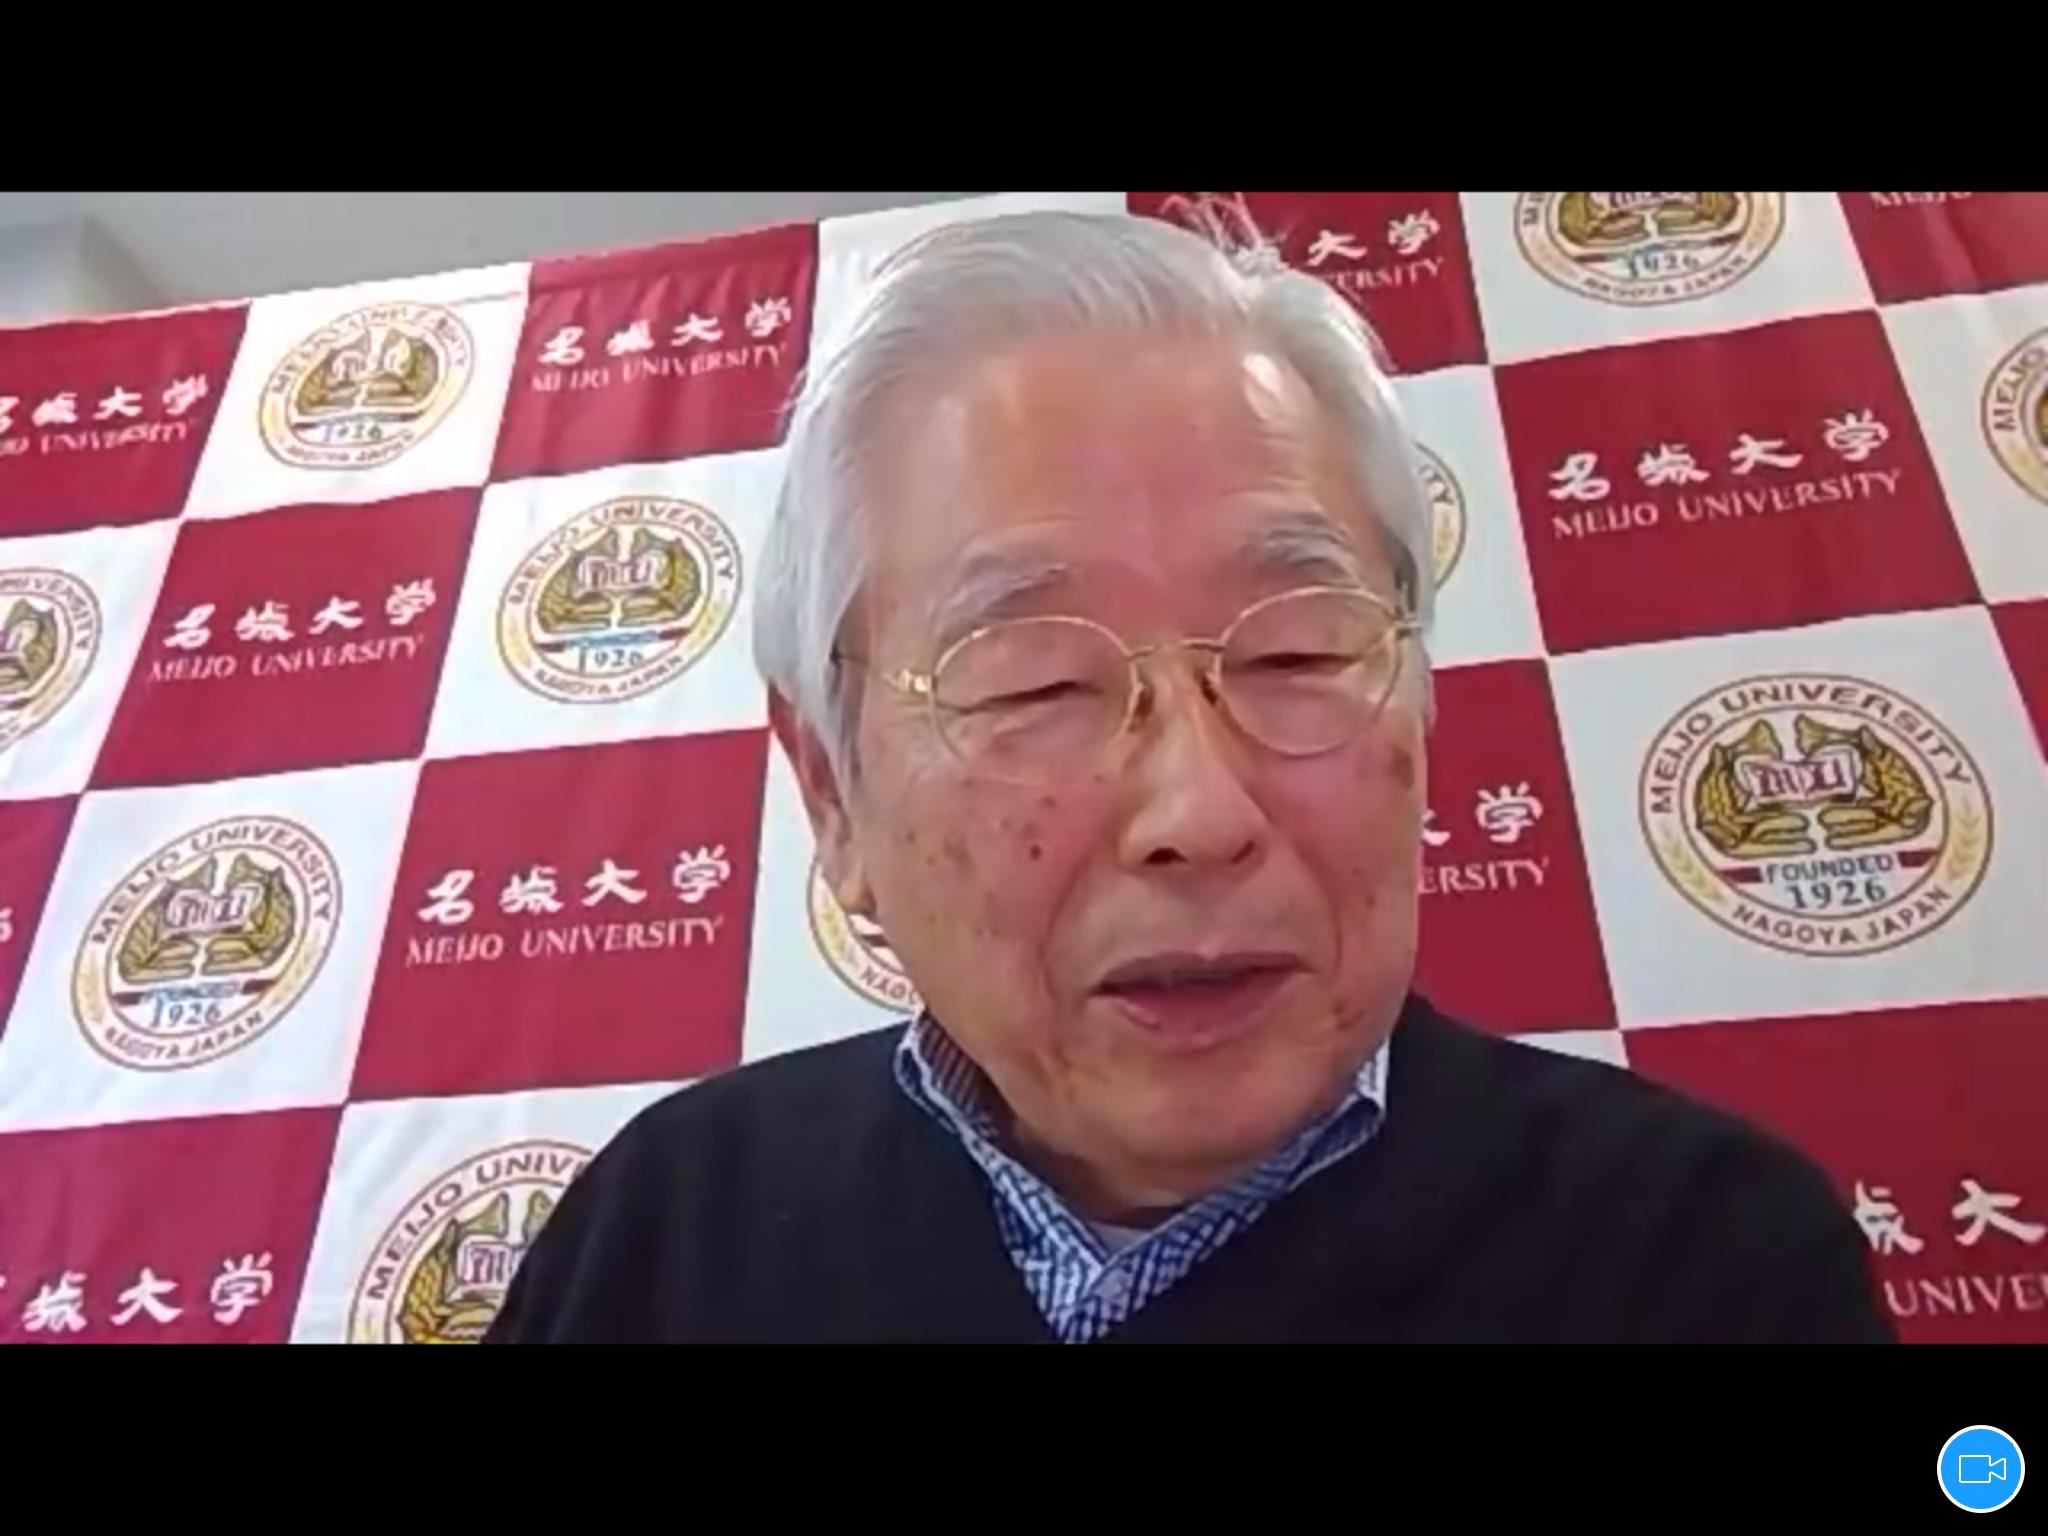 Zoomで記者の質問に答える飯島澄男終身教授